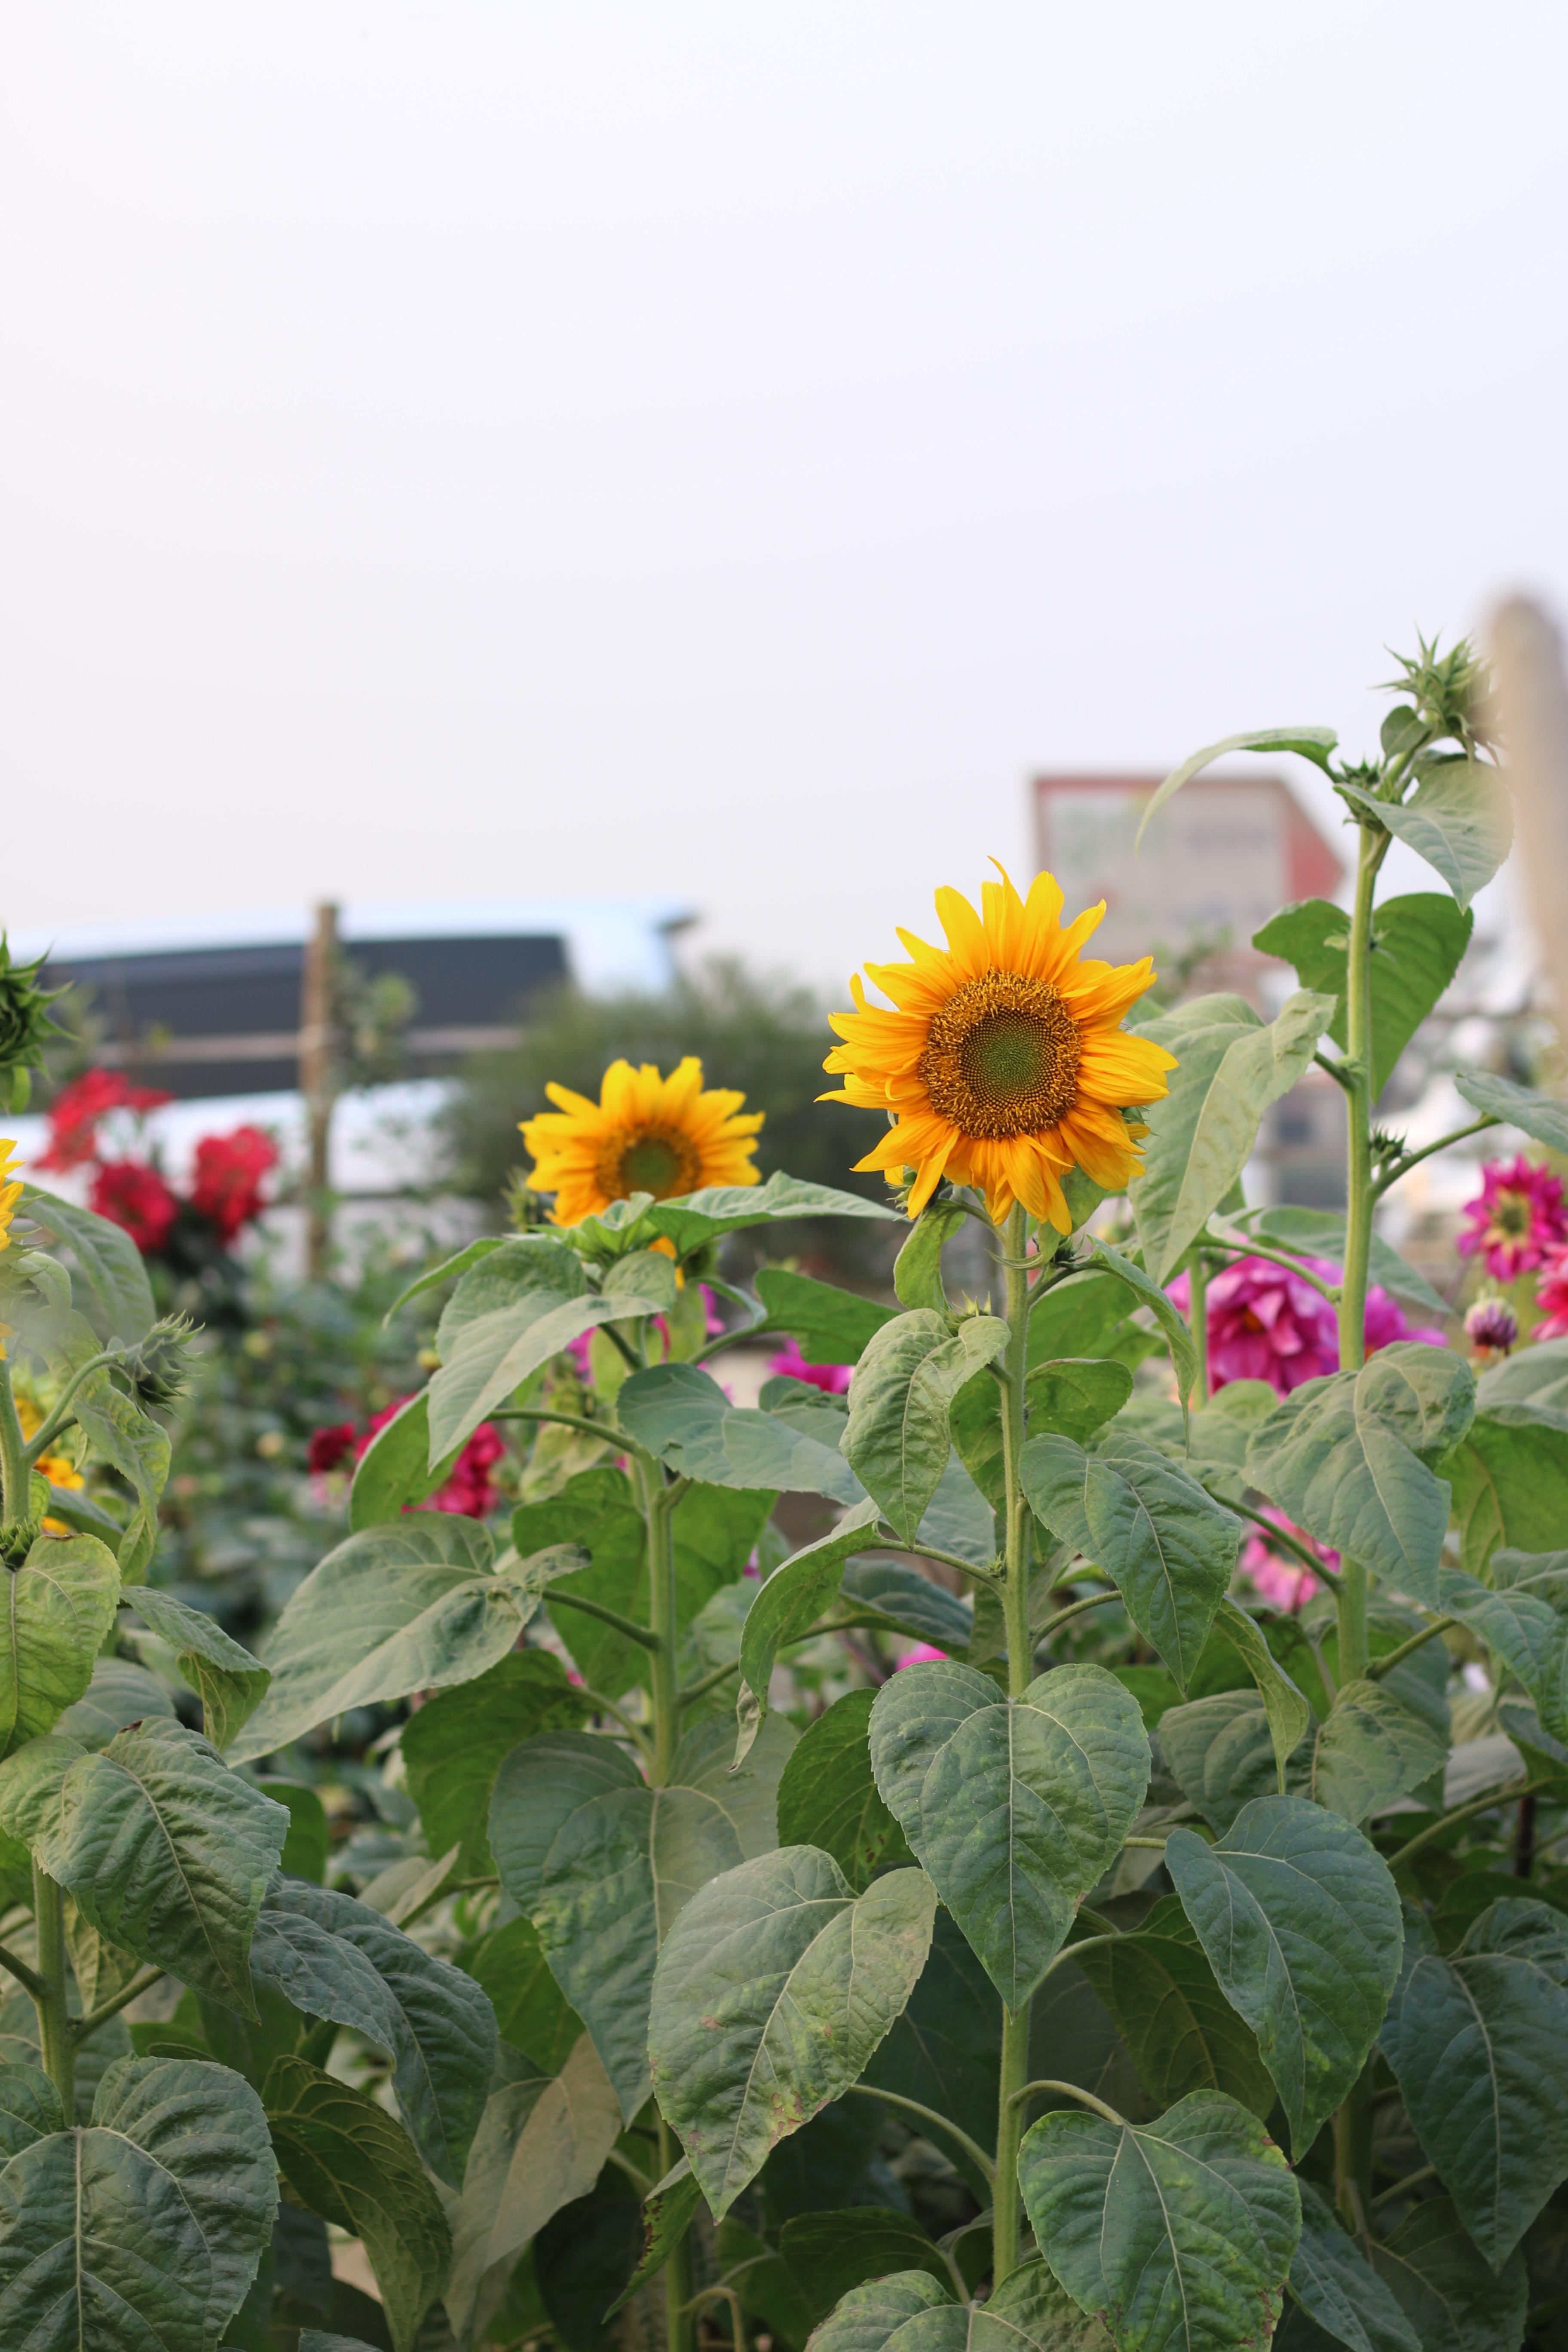 Sunflowers in a garden full of flowers